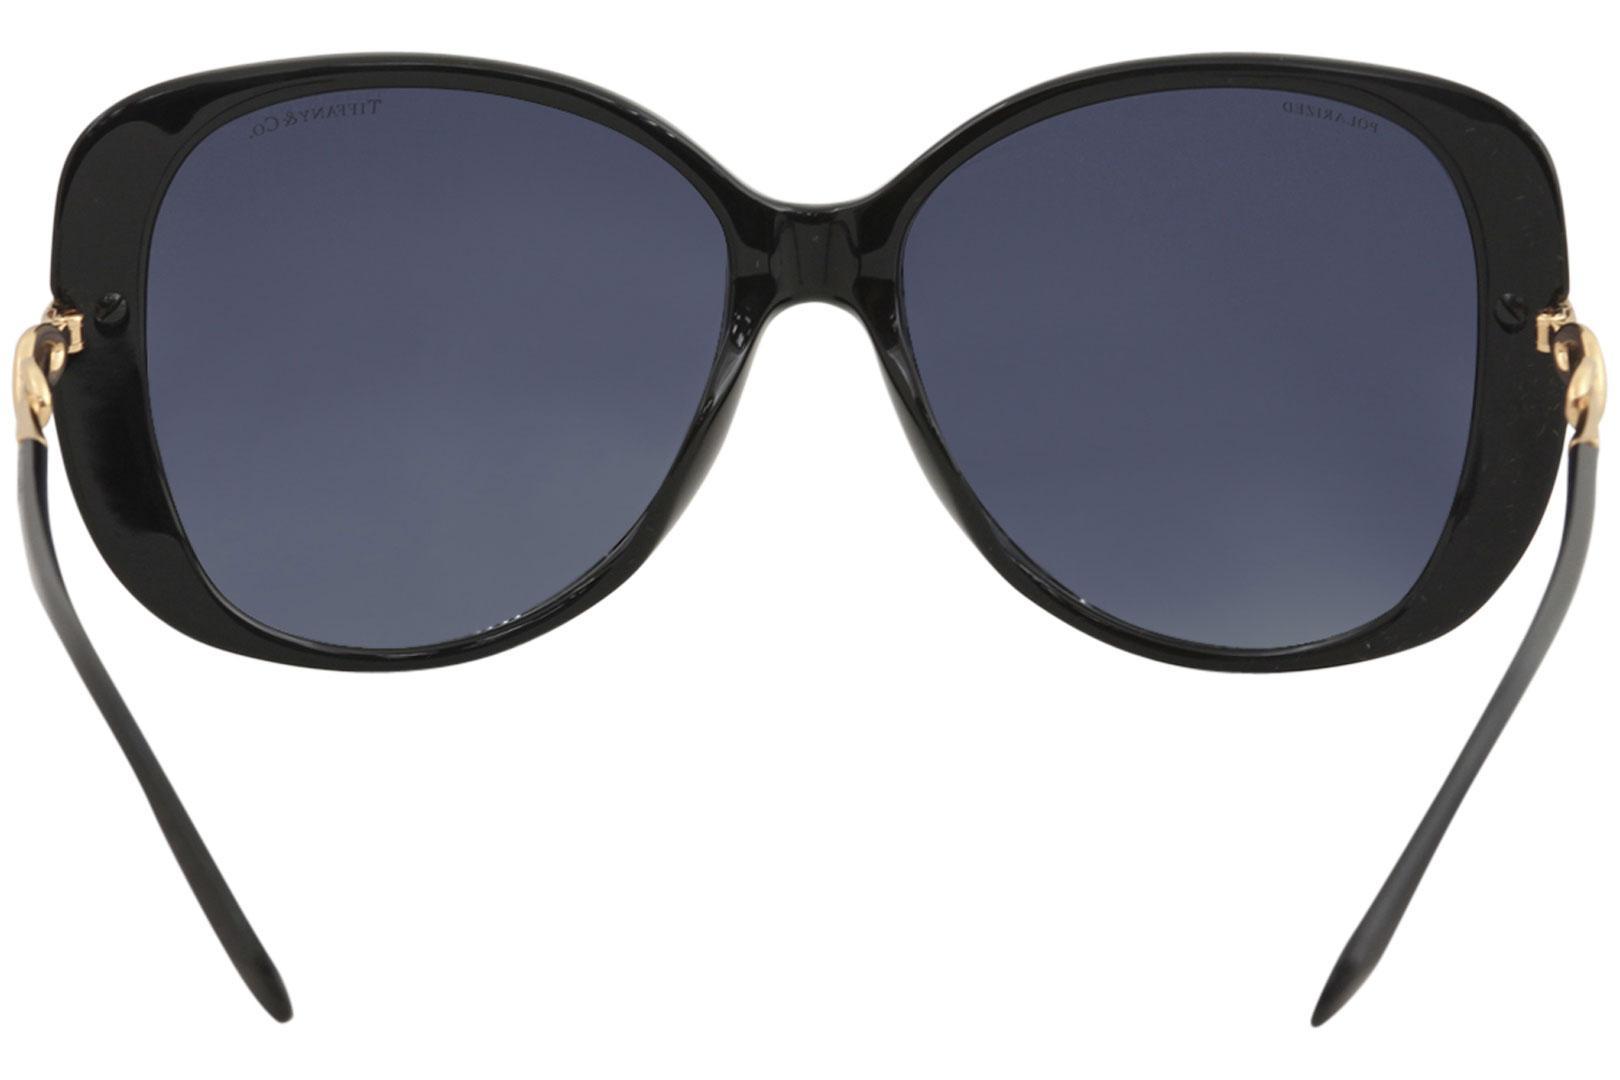 4af3fa86e41a4 Women s TF4126B TF 4126 B Fashion Butterfly Polarized Sunglasses by Tiffany    Co. 12345